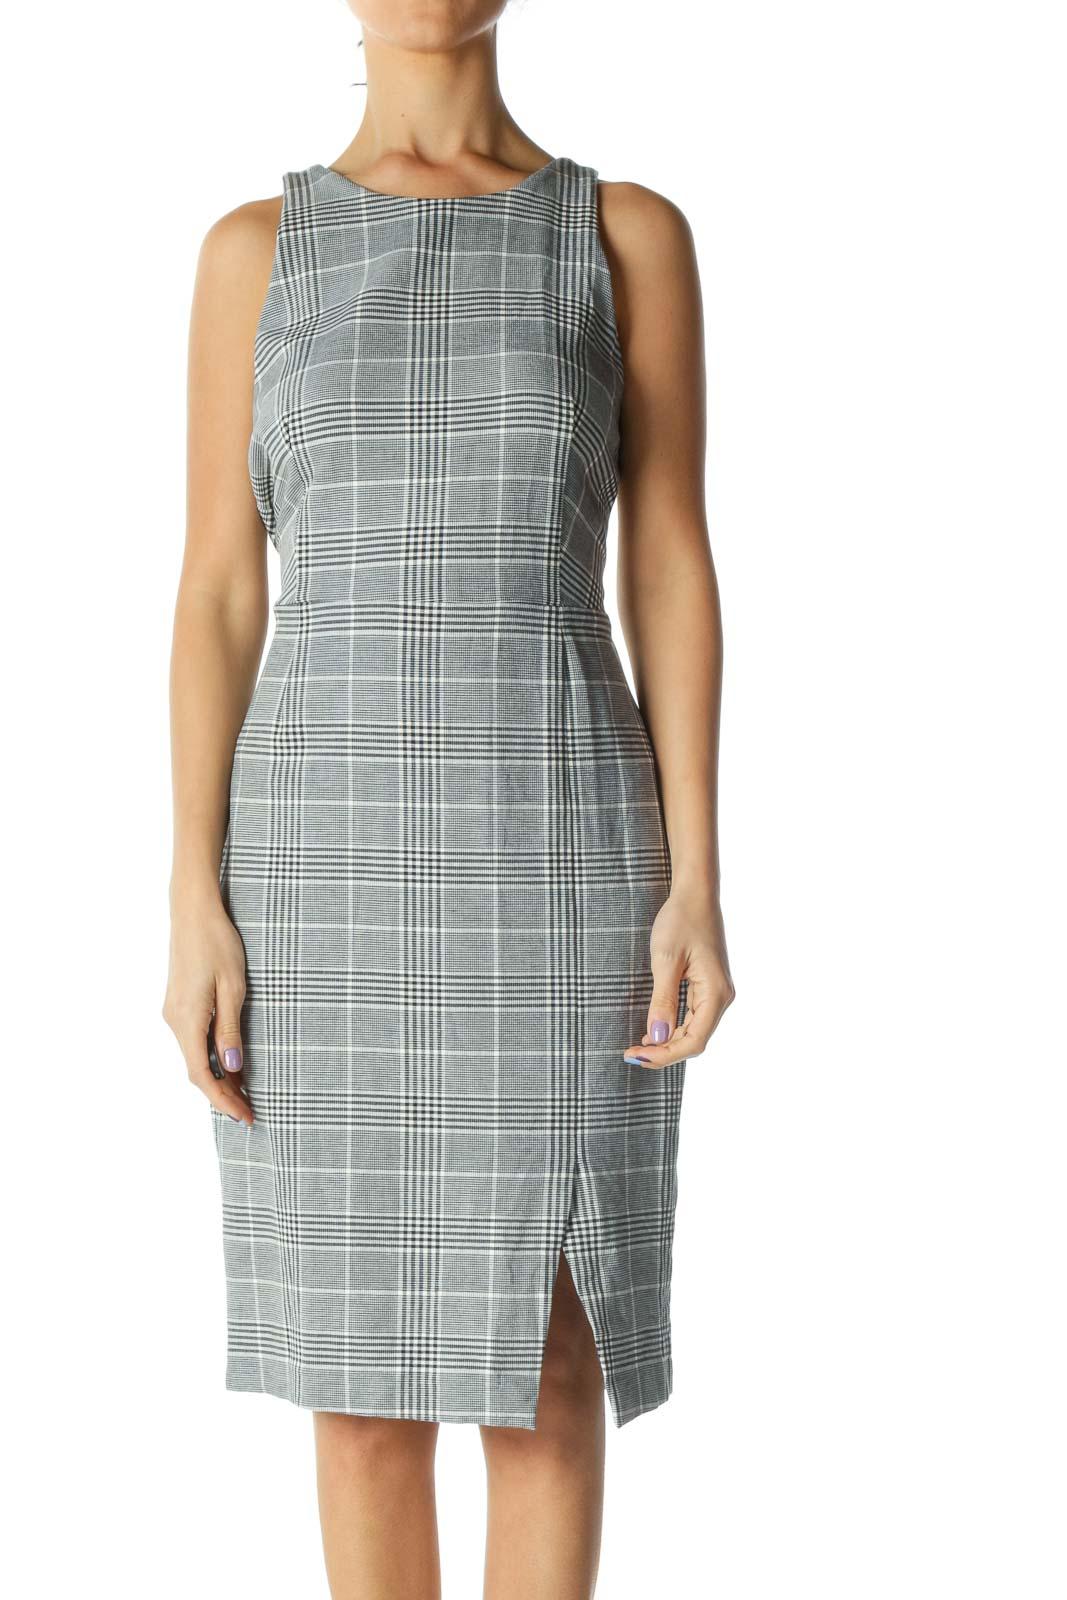 Gray Plaid Work Dress Front